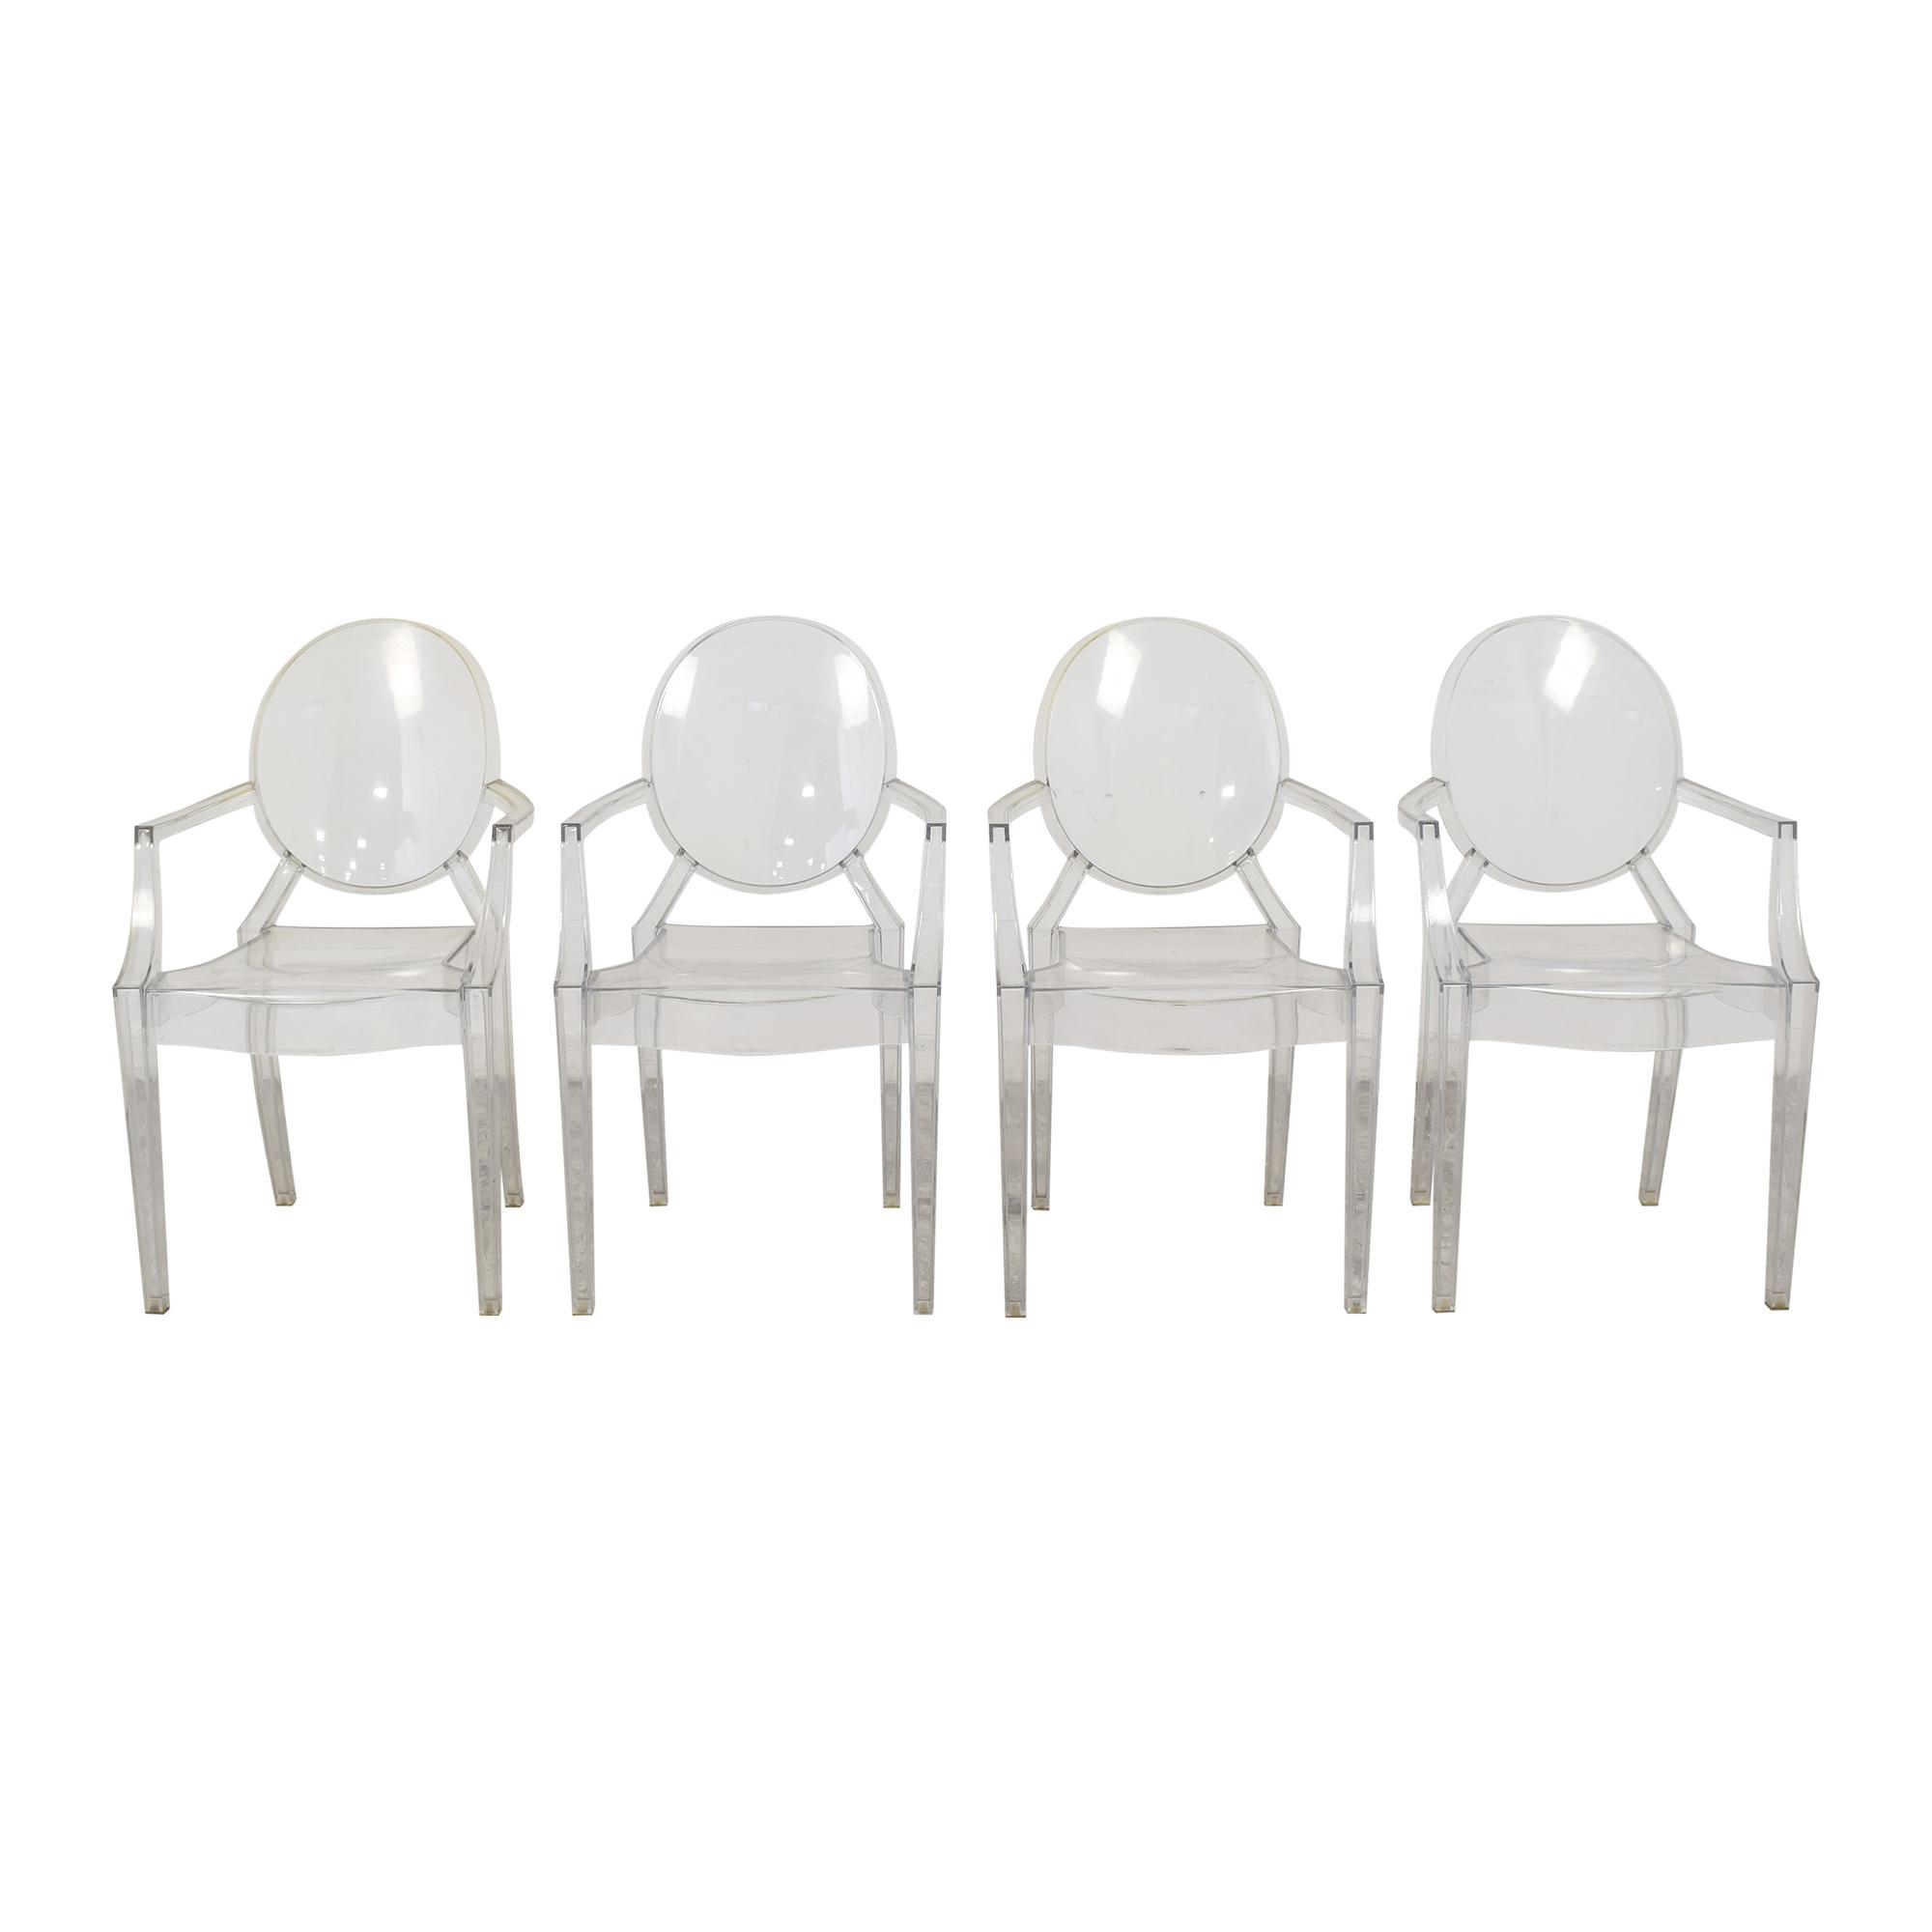 Poly & Bark Poly & Bark Ghost Style Arm Chairs ma